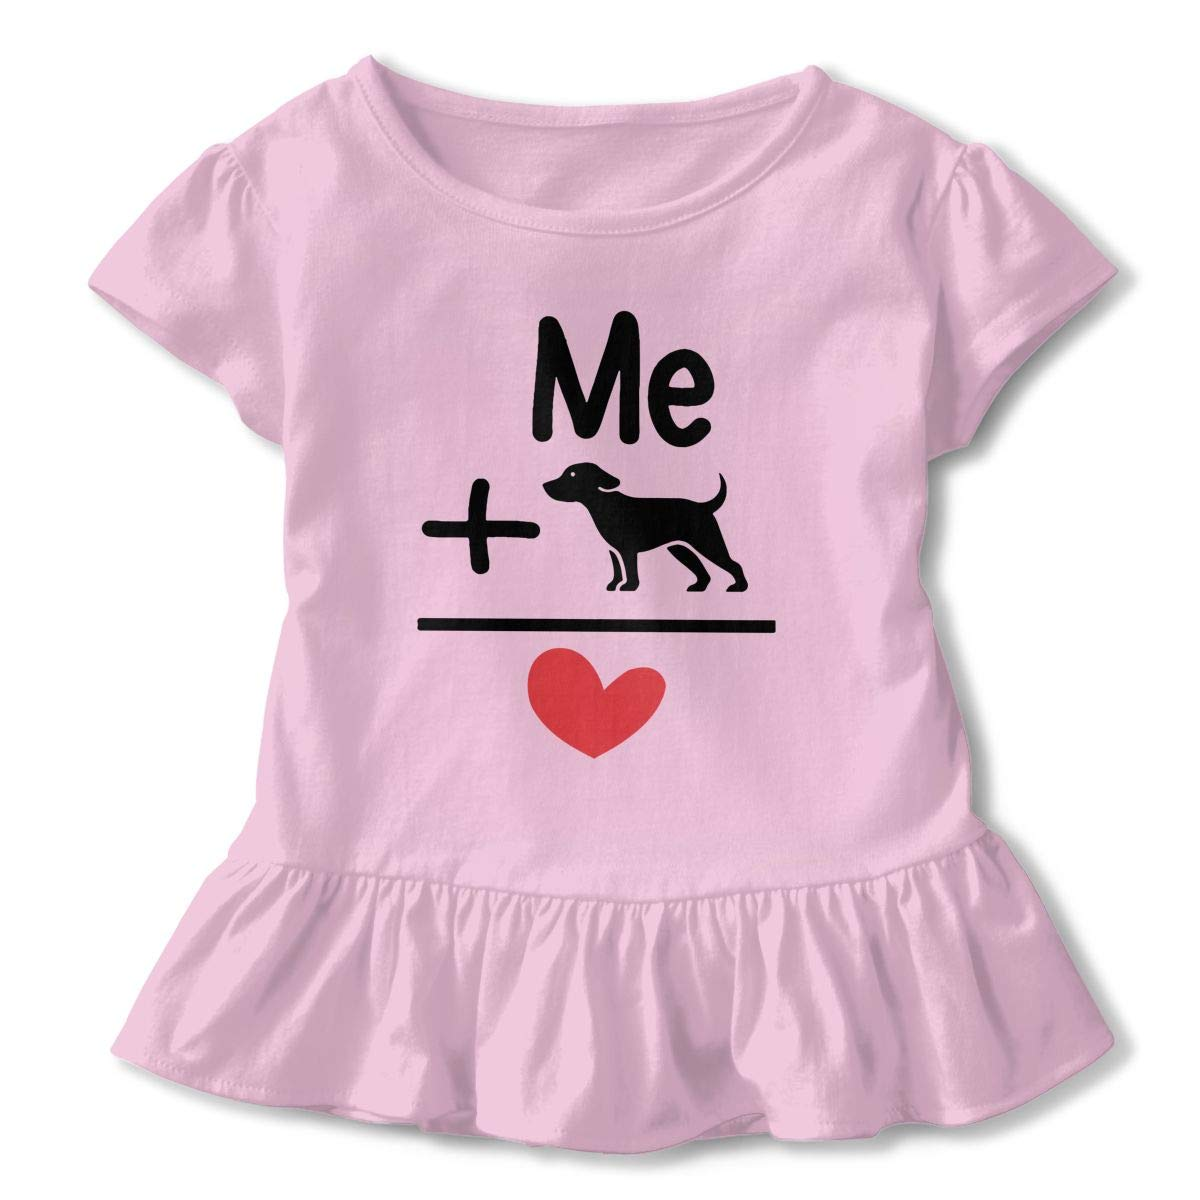 Me Dogs = Love Kids Girls Short Sleeve Ruffles Shirt T-Shirt for 2-6 Toddlers